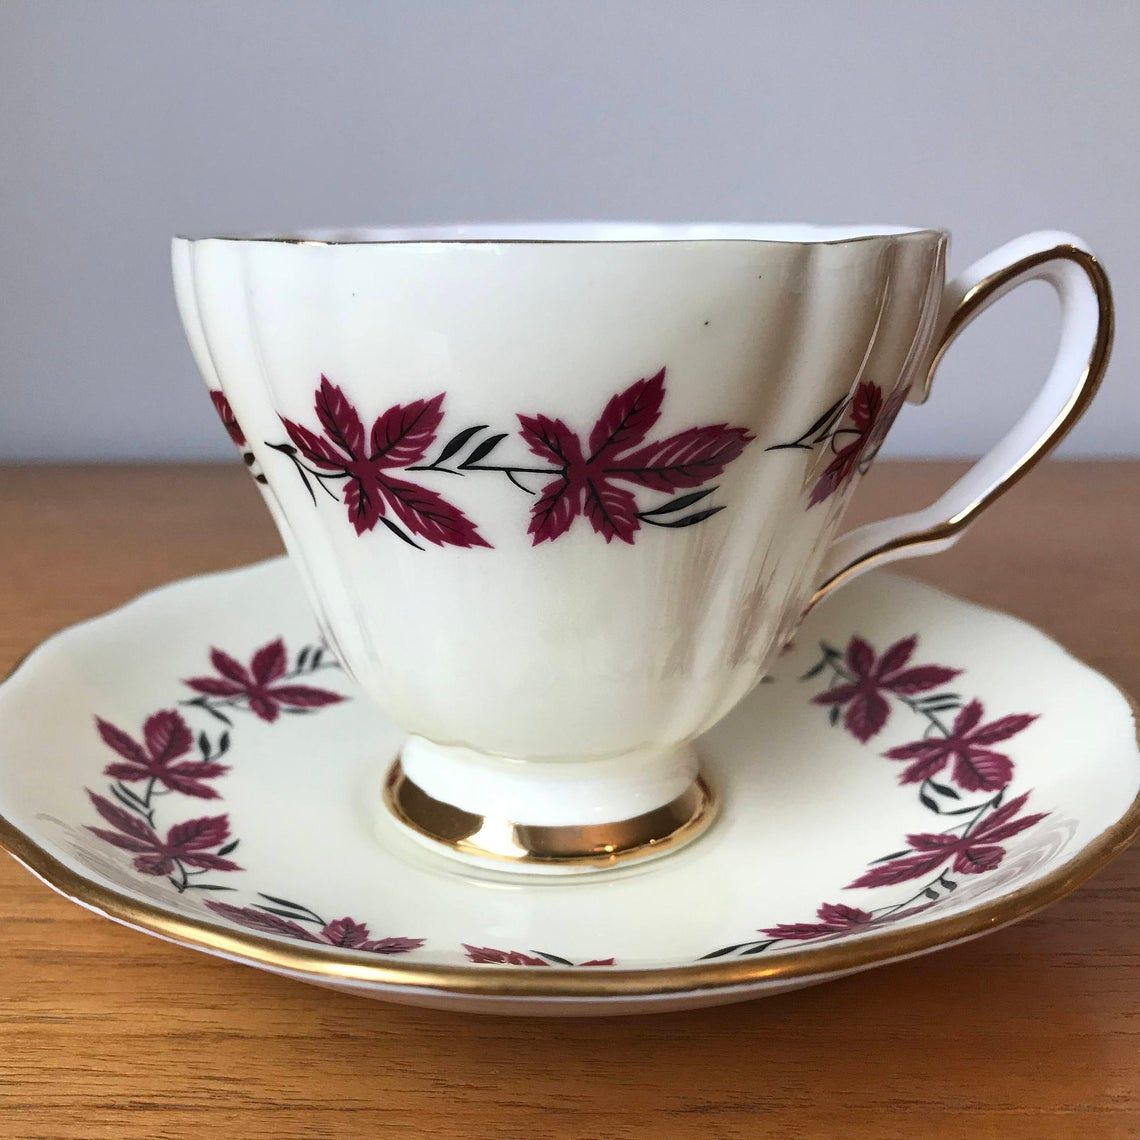 Colclough Vintage Teacup and Saucer Dark Pink Leaf Cream Tea Cup and Saucer, Bone China